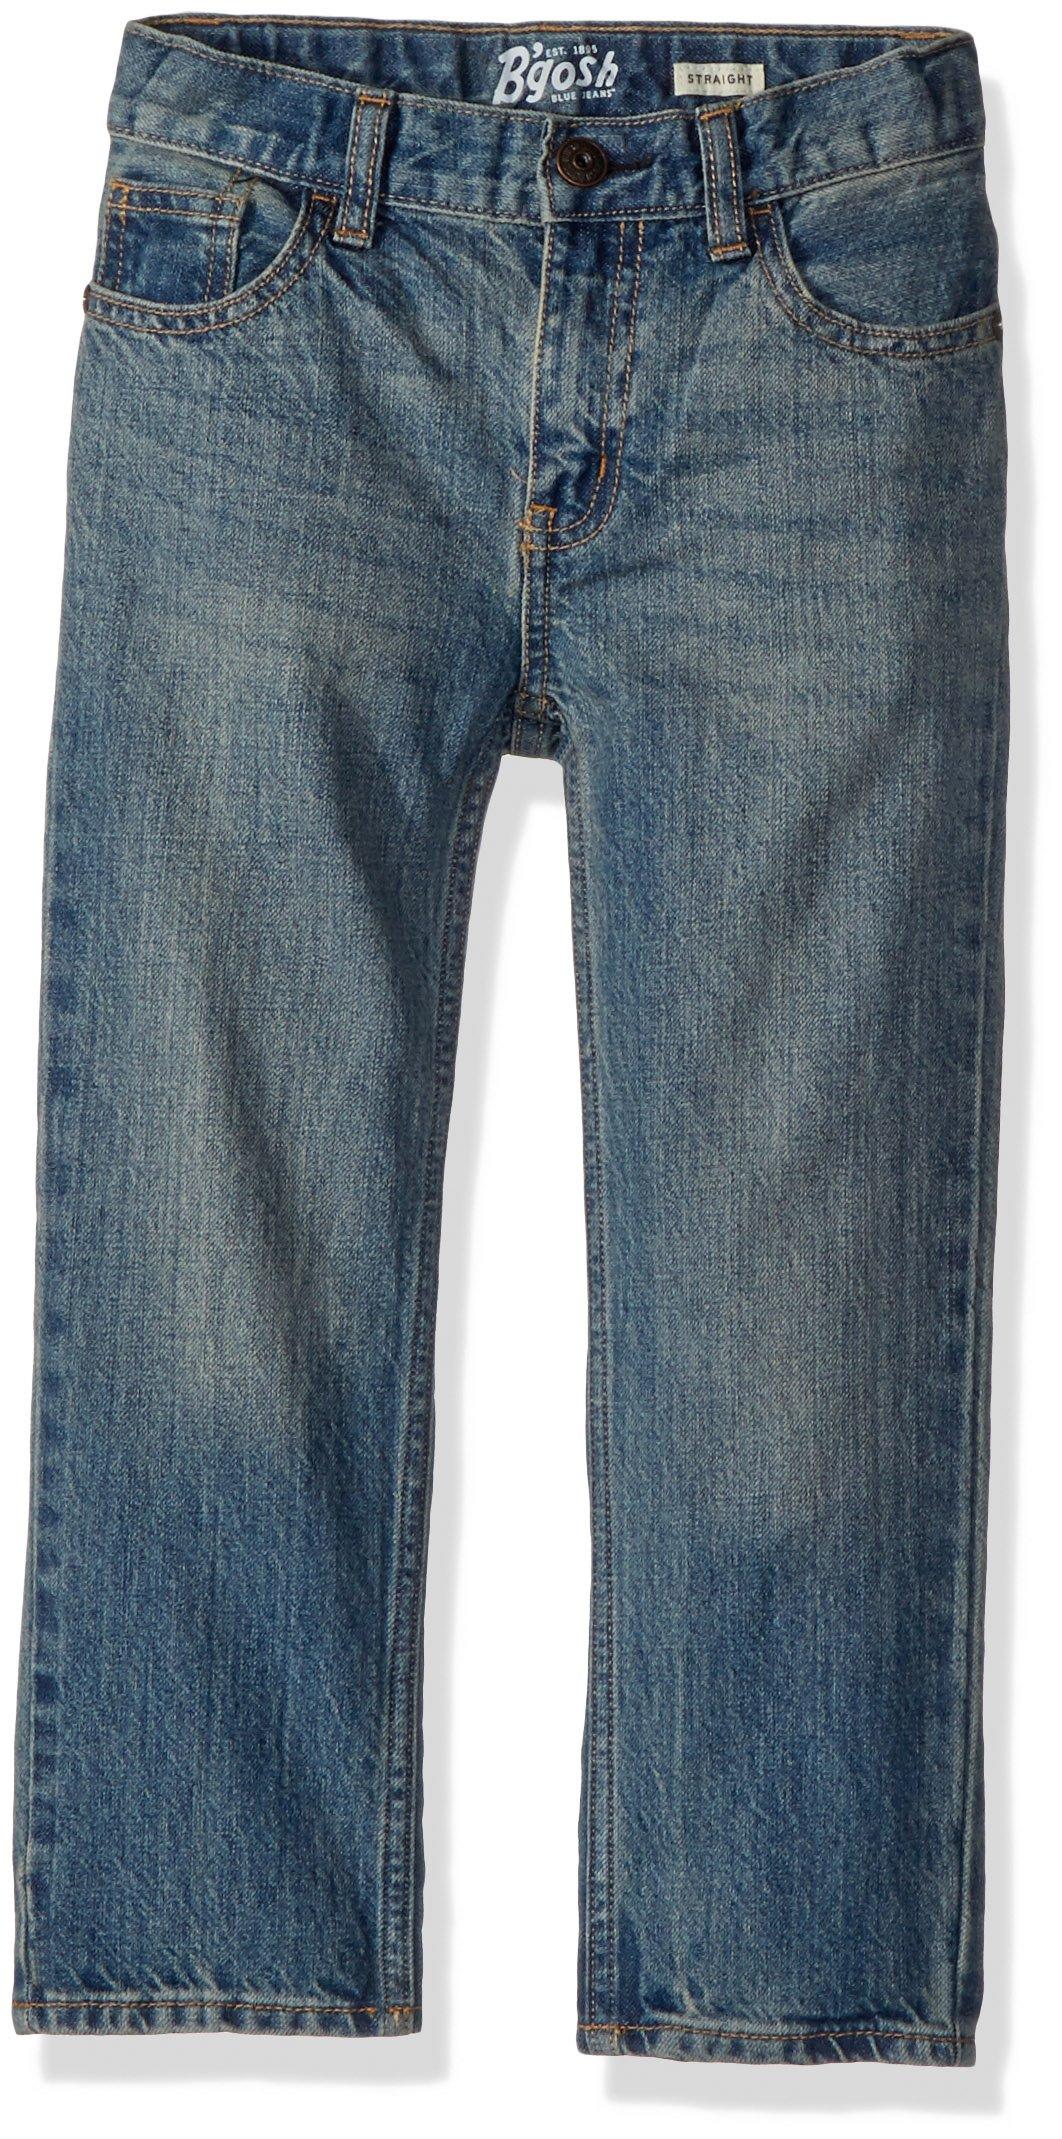 Osh Kosh Boys' Straight Jeans, Blue Copper Tone, 6R